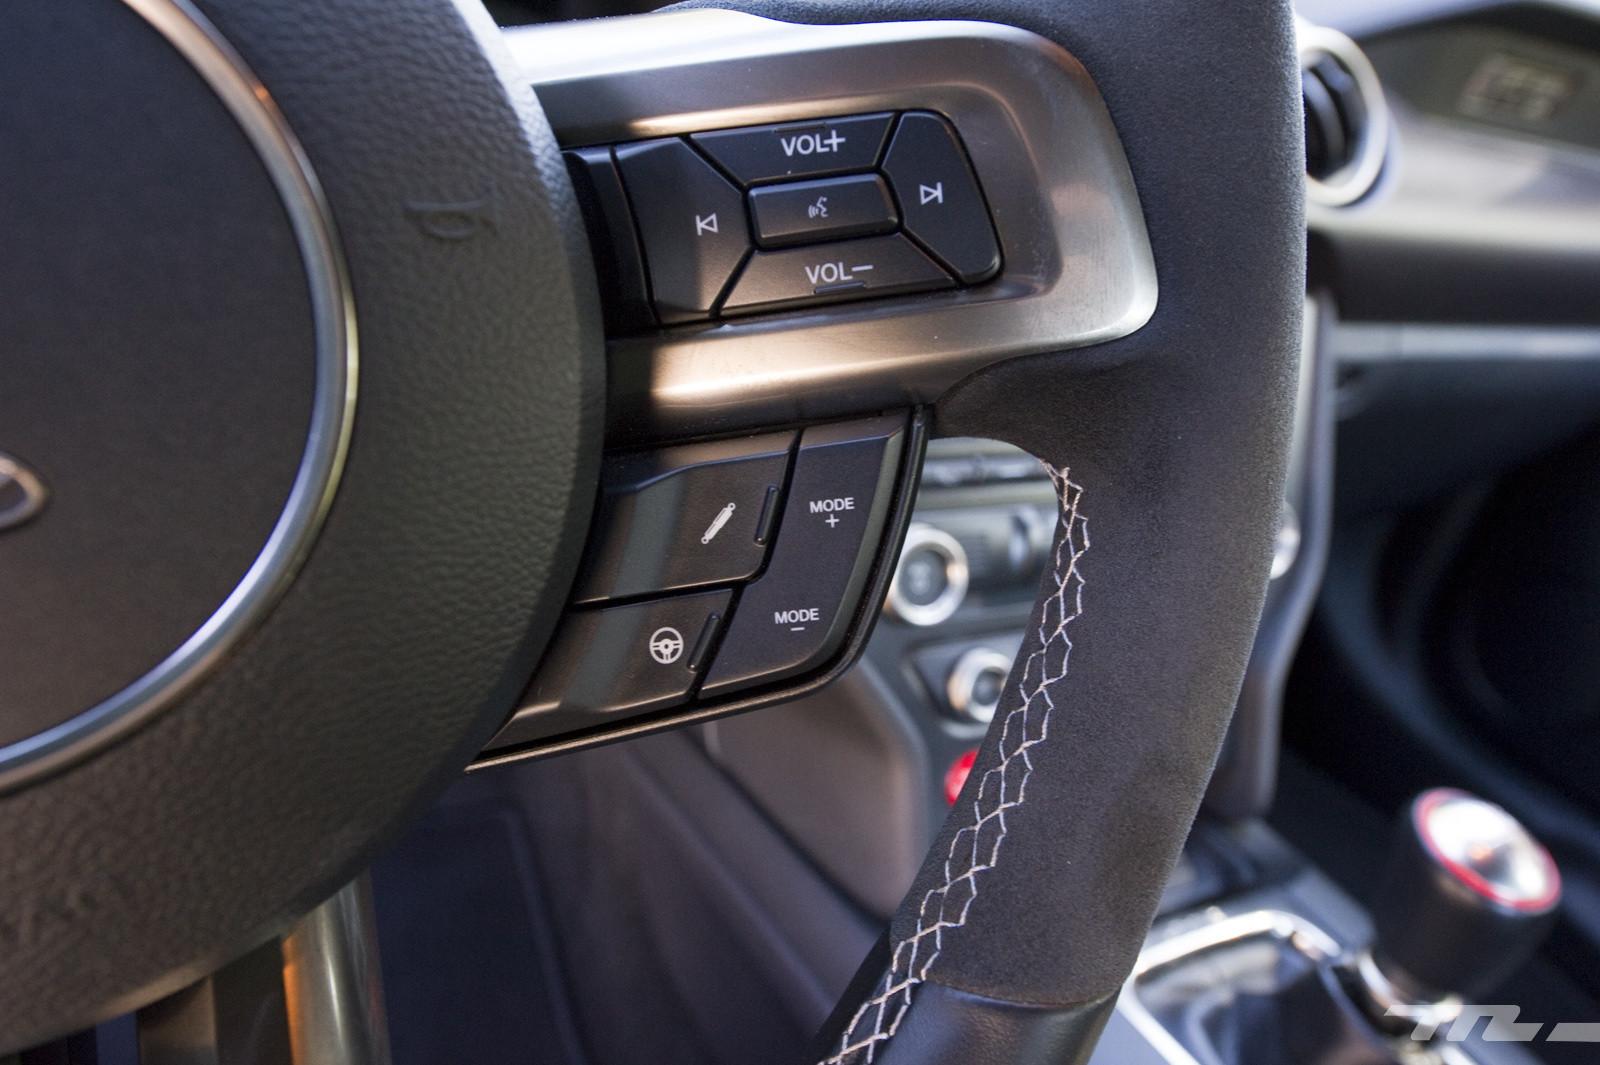 Ford Mustang Shelby Gt350 Prueba 33 40